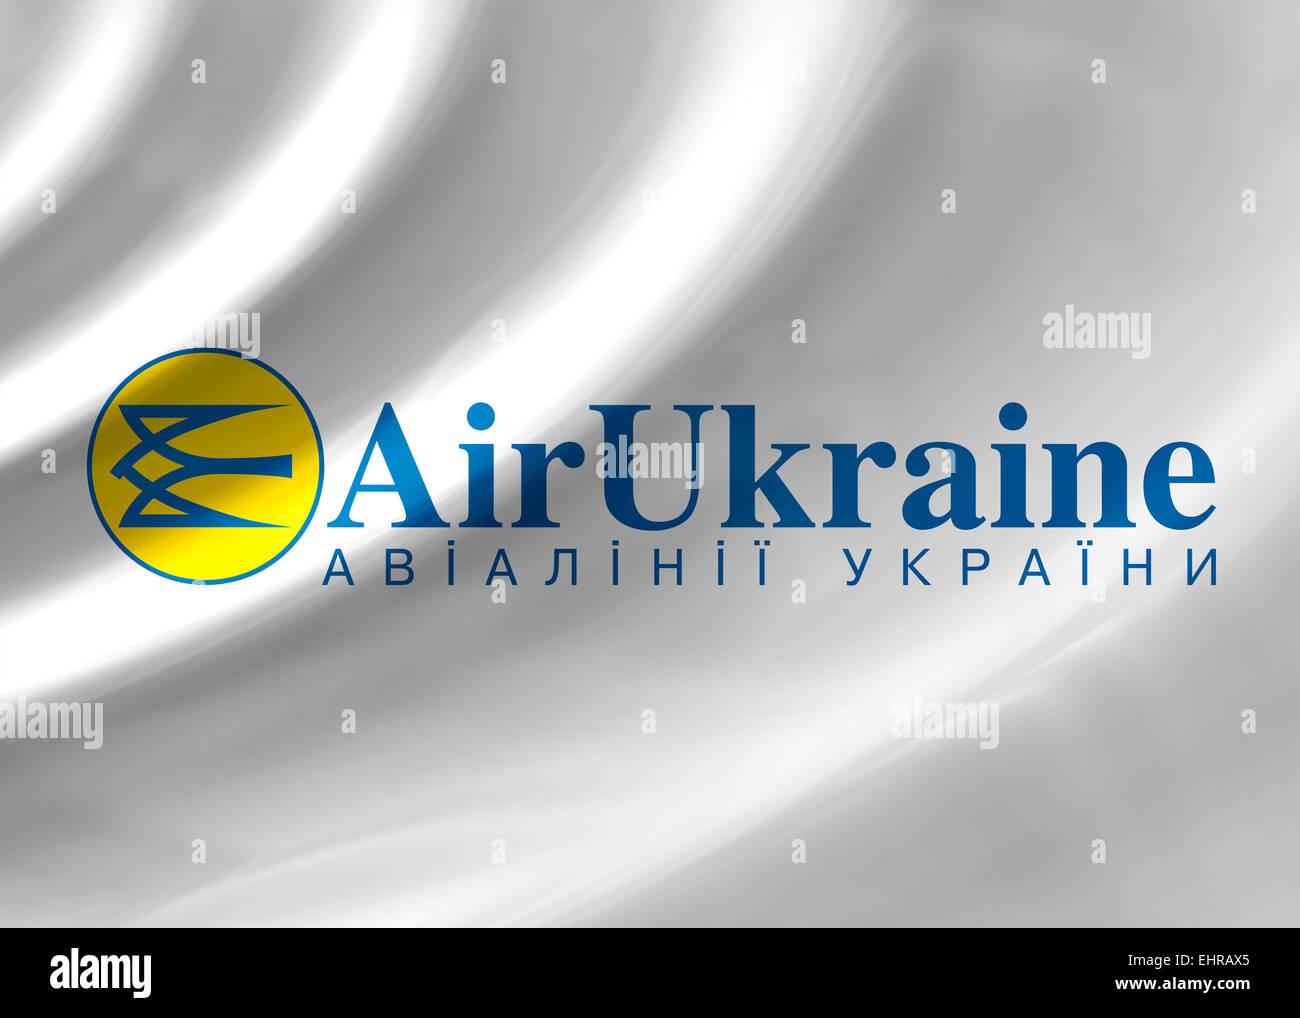 Aria ucraina logo icona simbolo bandiera emblema Foto Stock